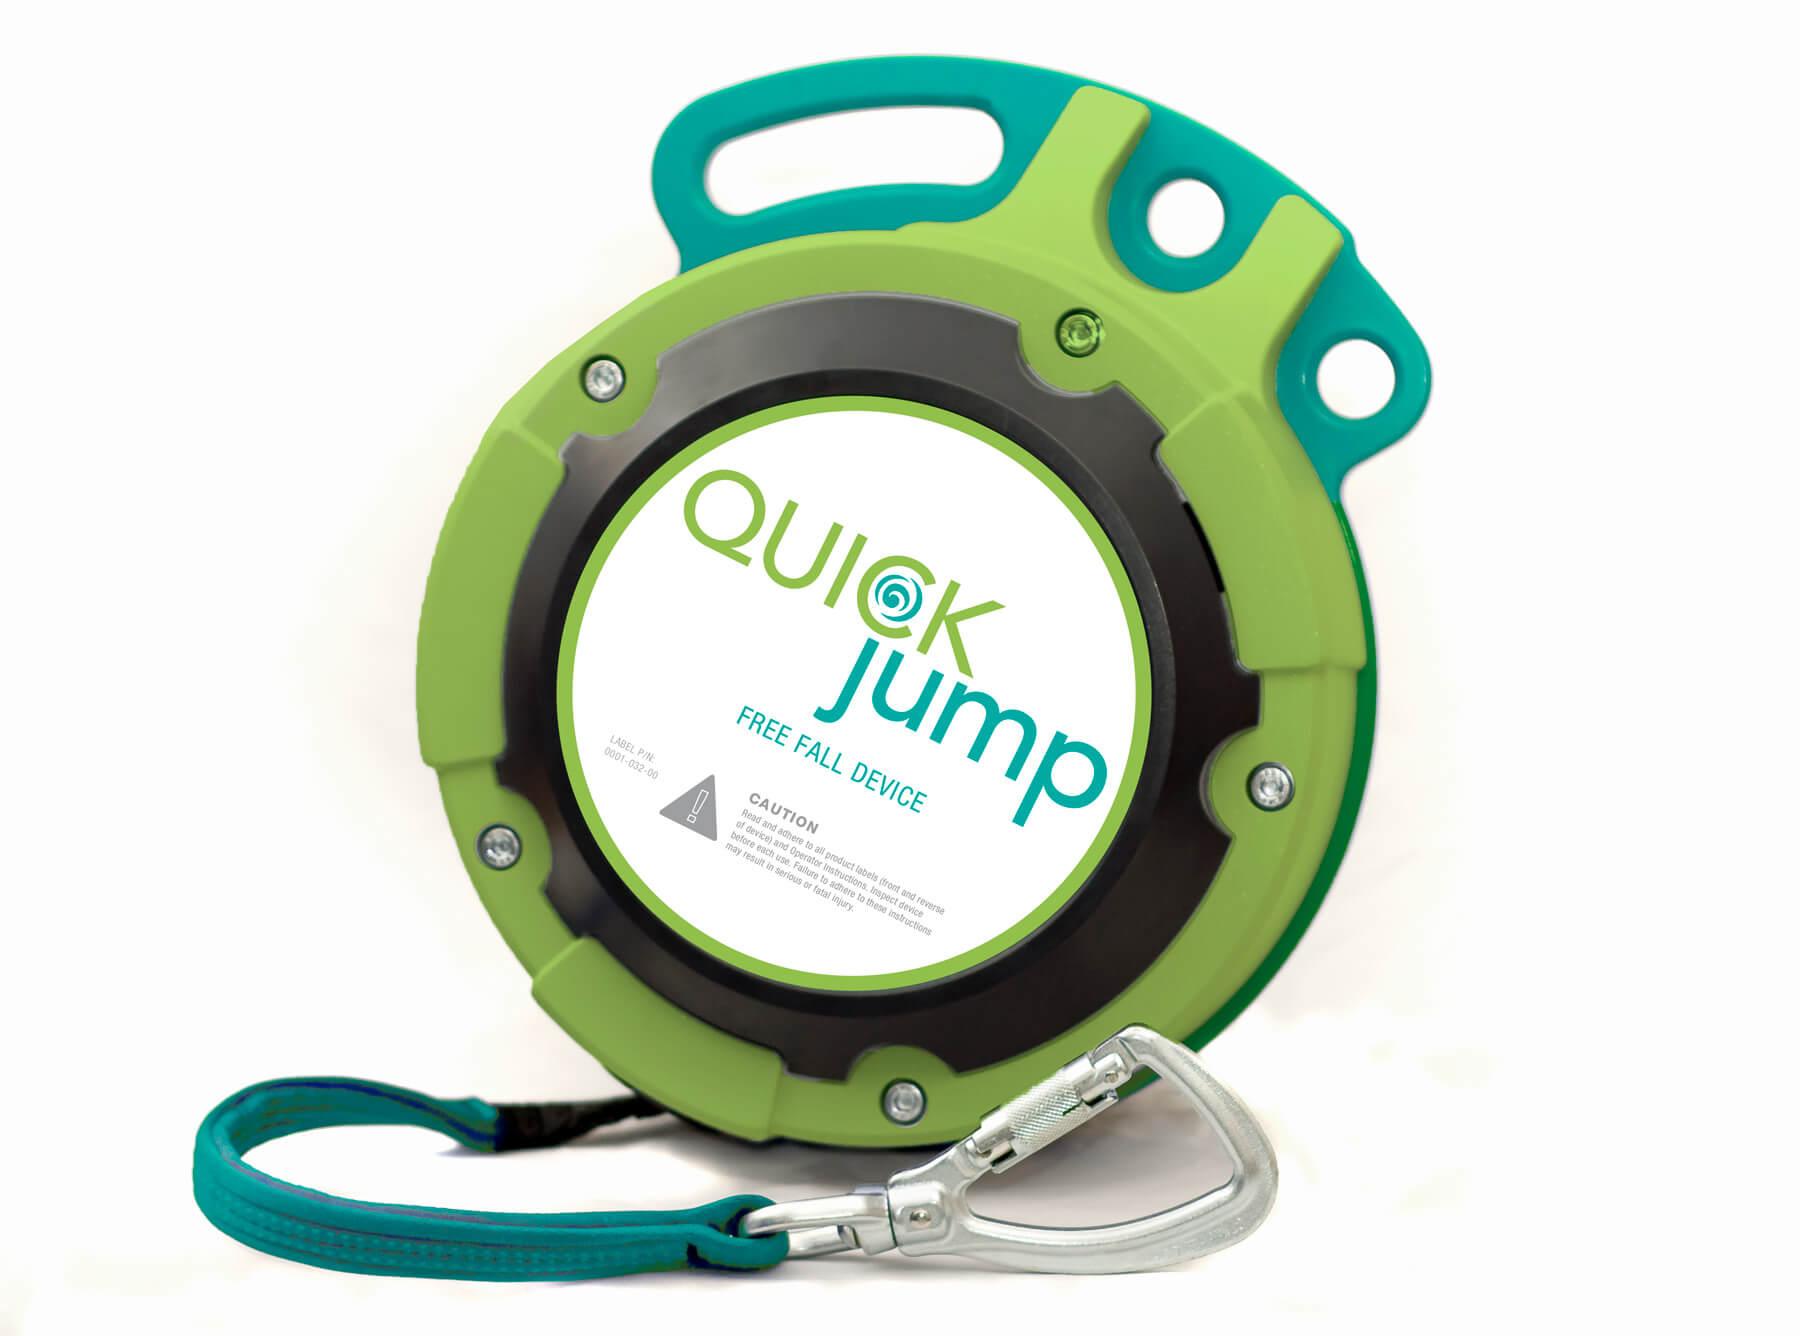 quickjump-comp-blueout